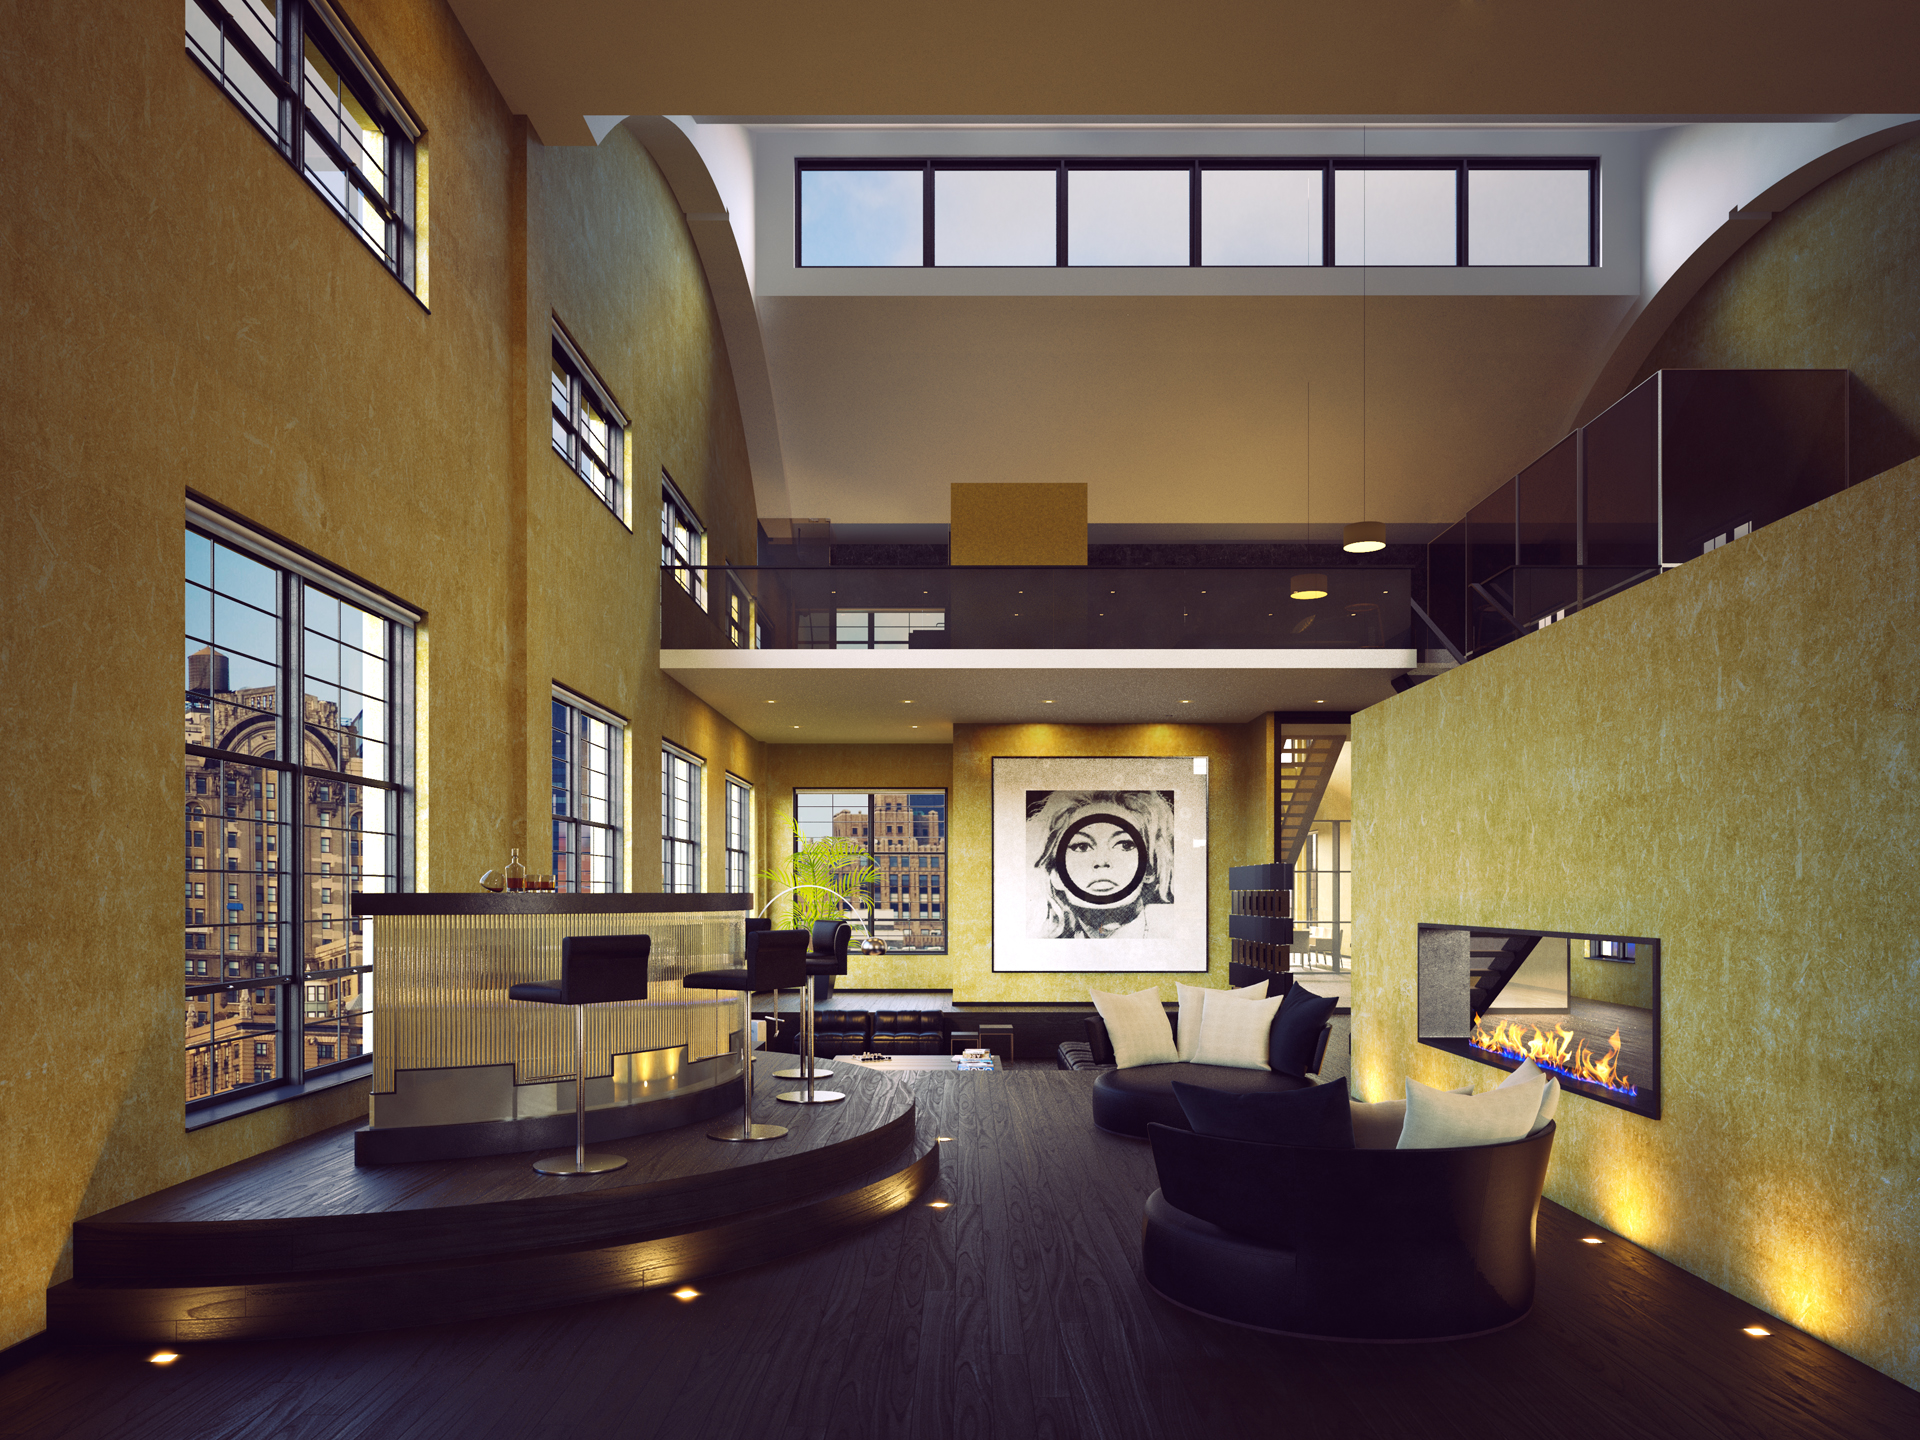 Golden and Black living room